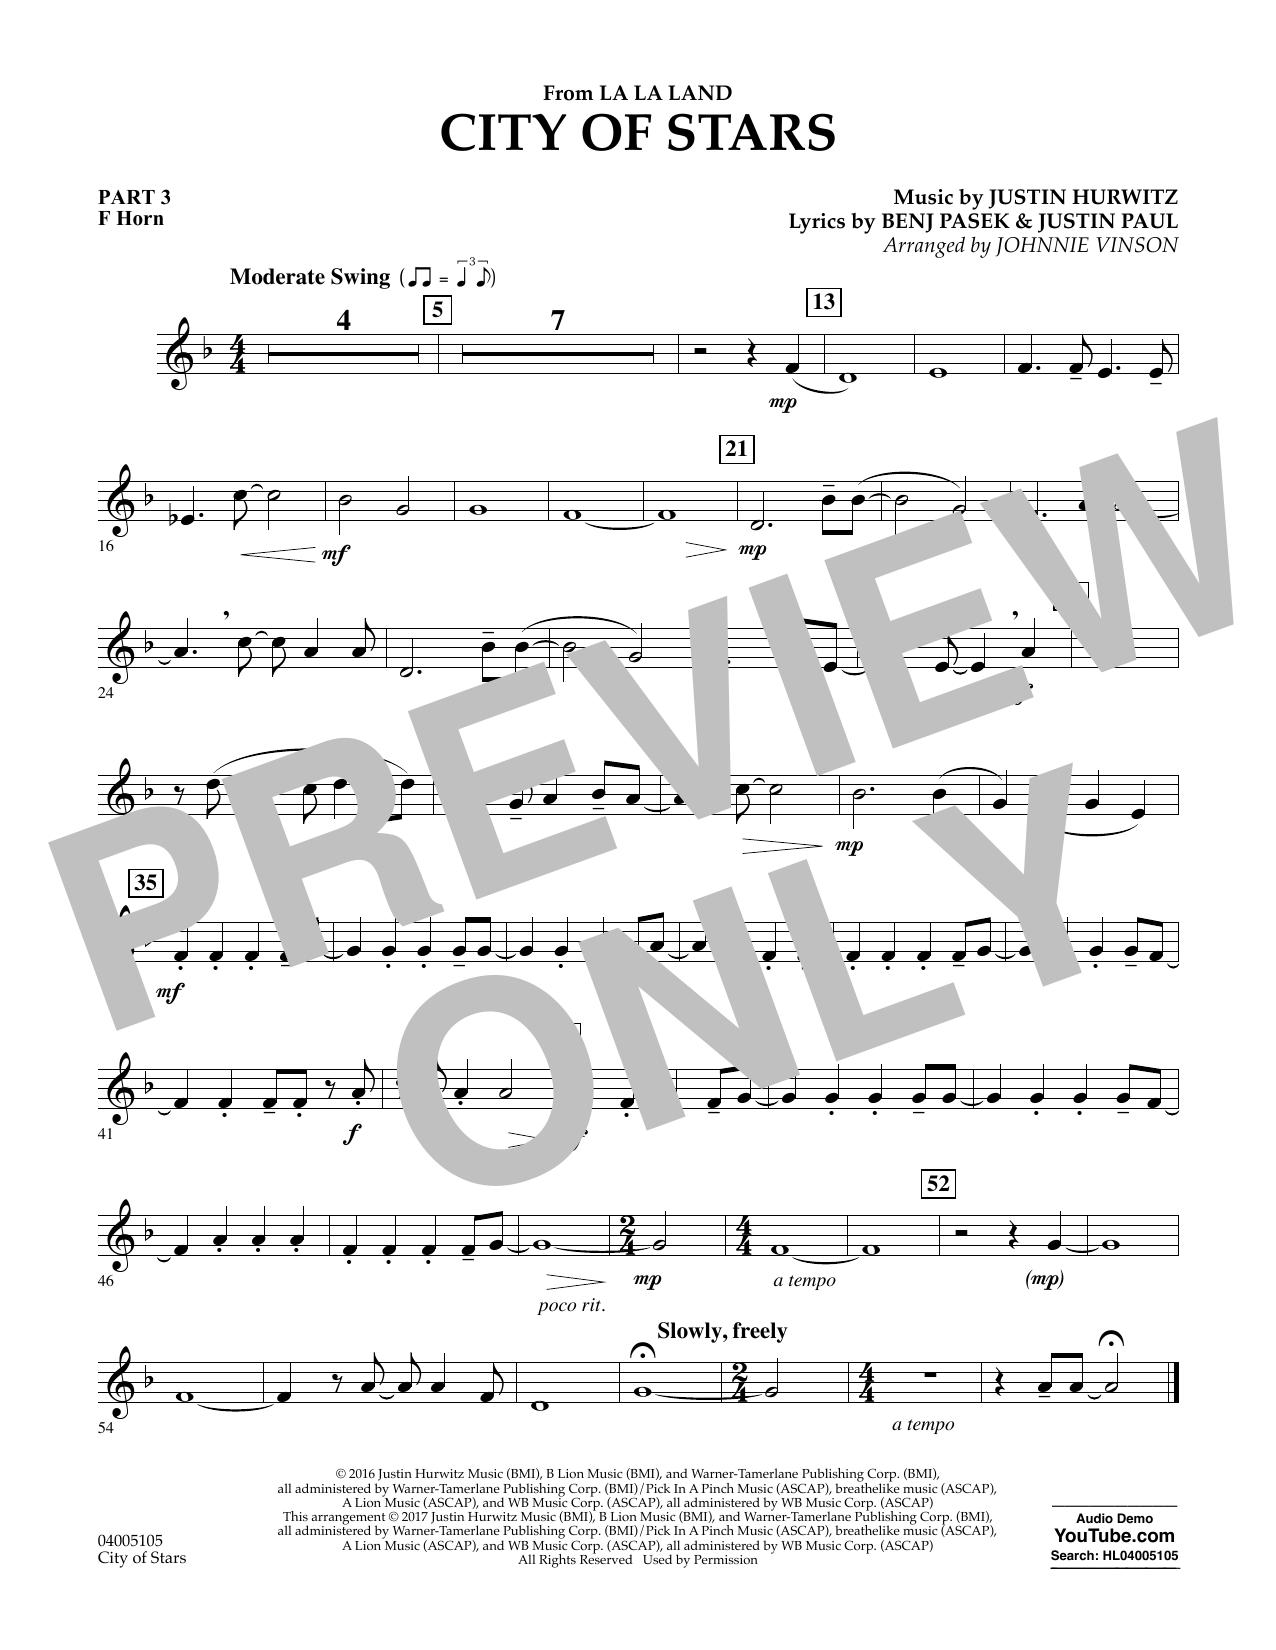 City of Stars (from La La Land) - Pt.3 - F Horn Sheet Music